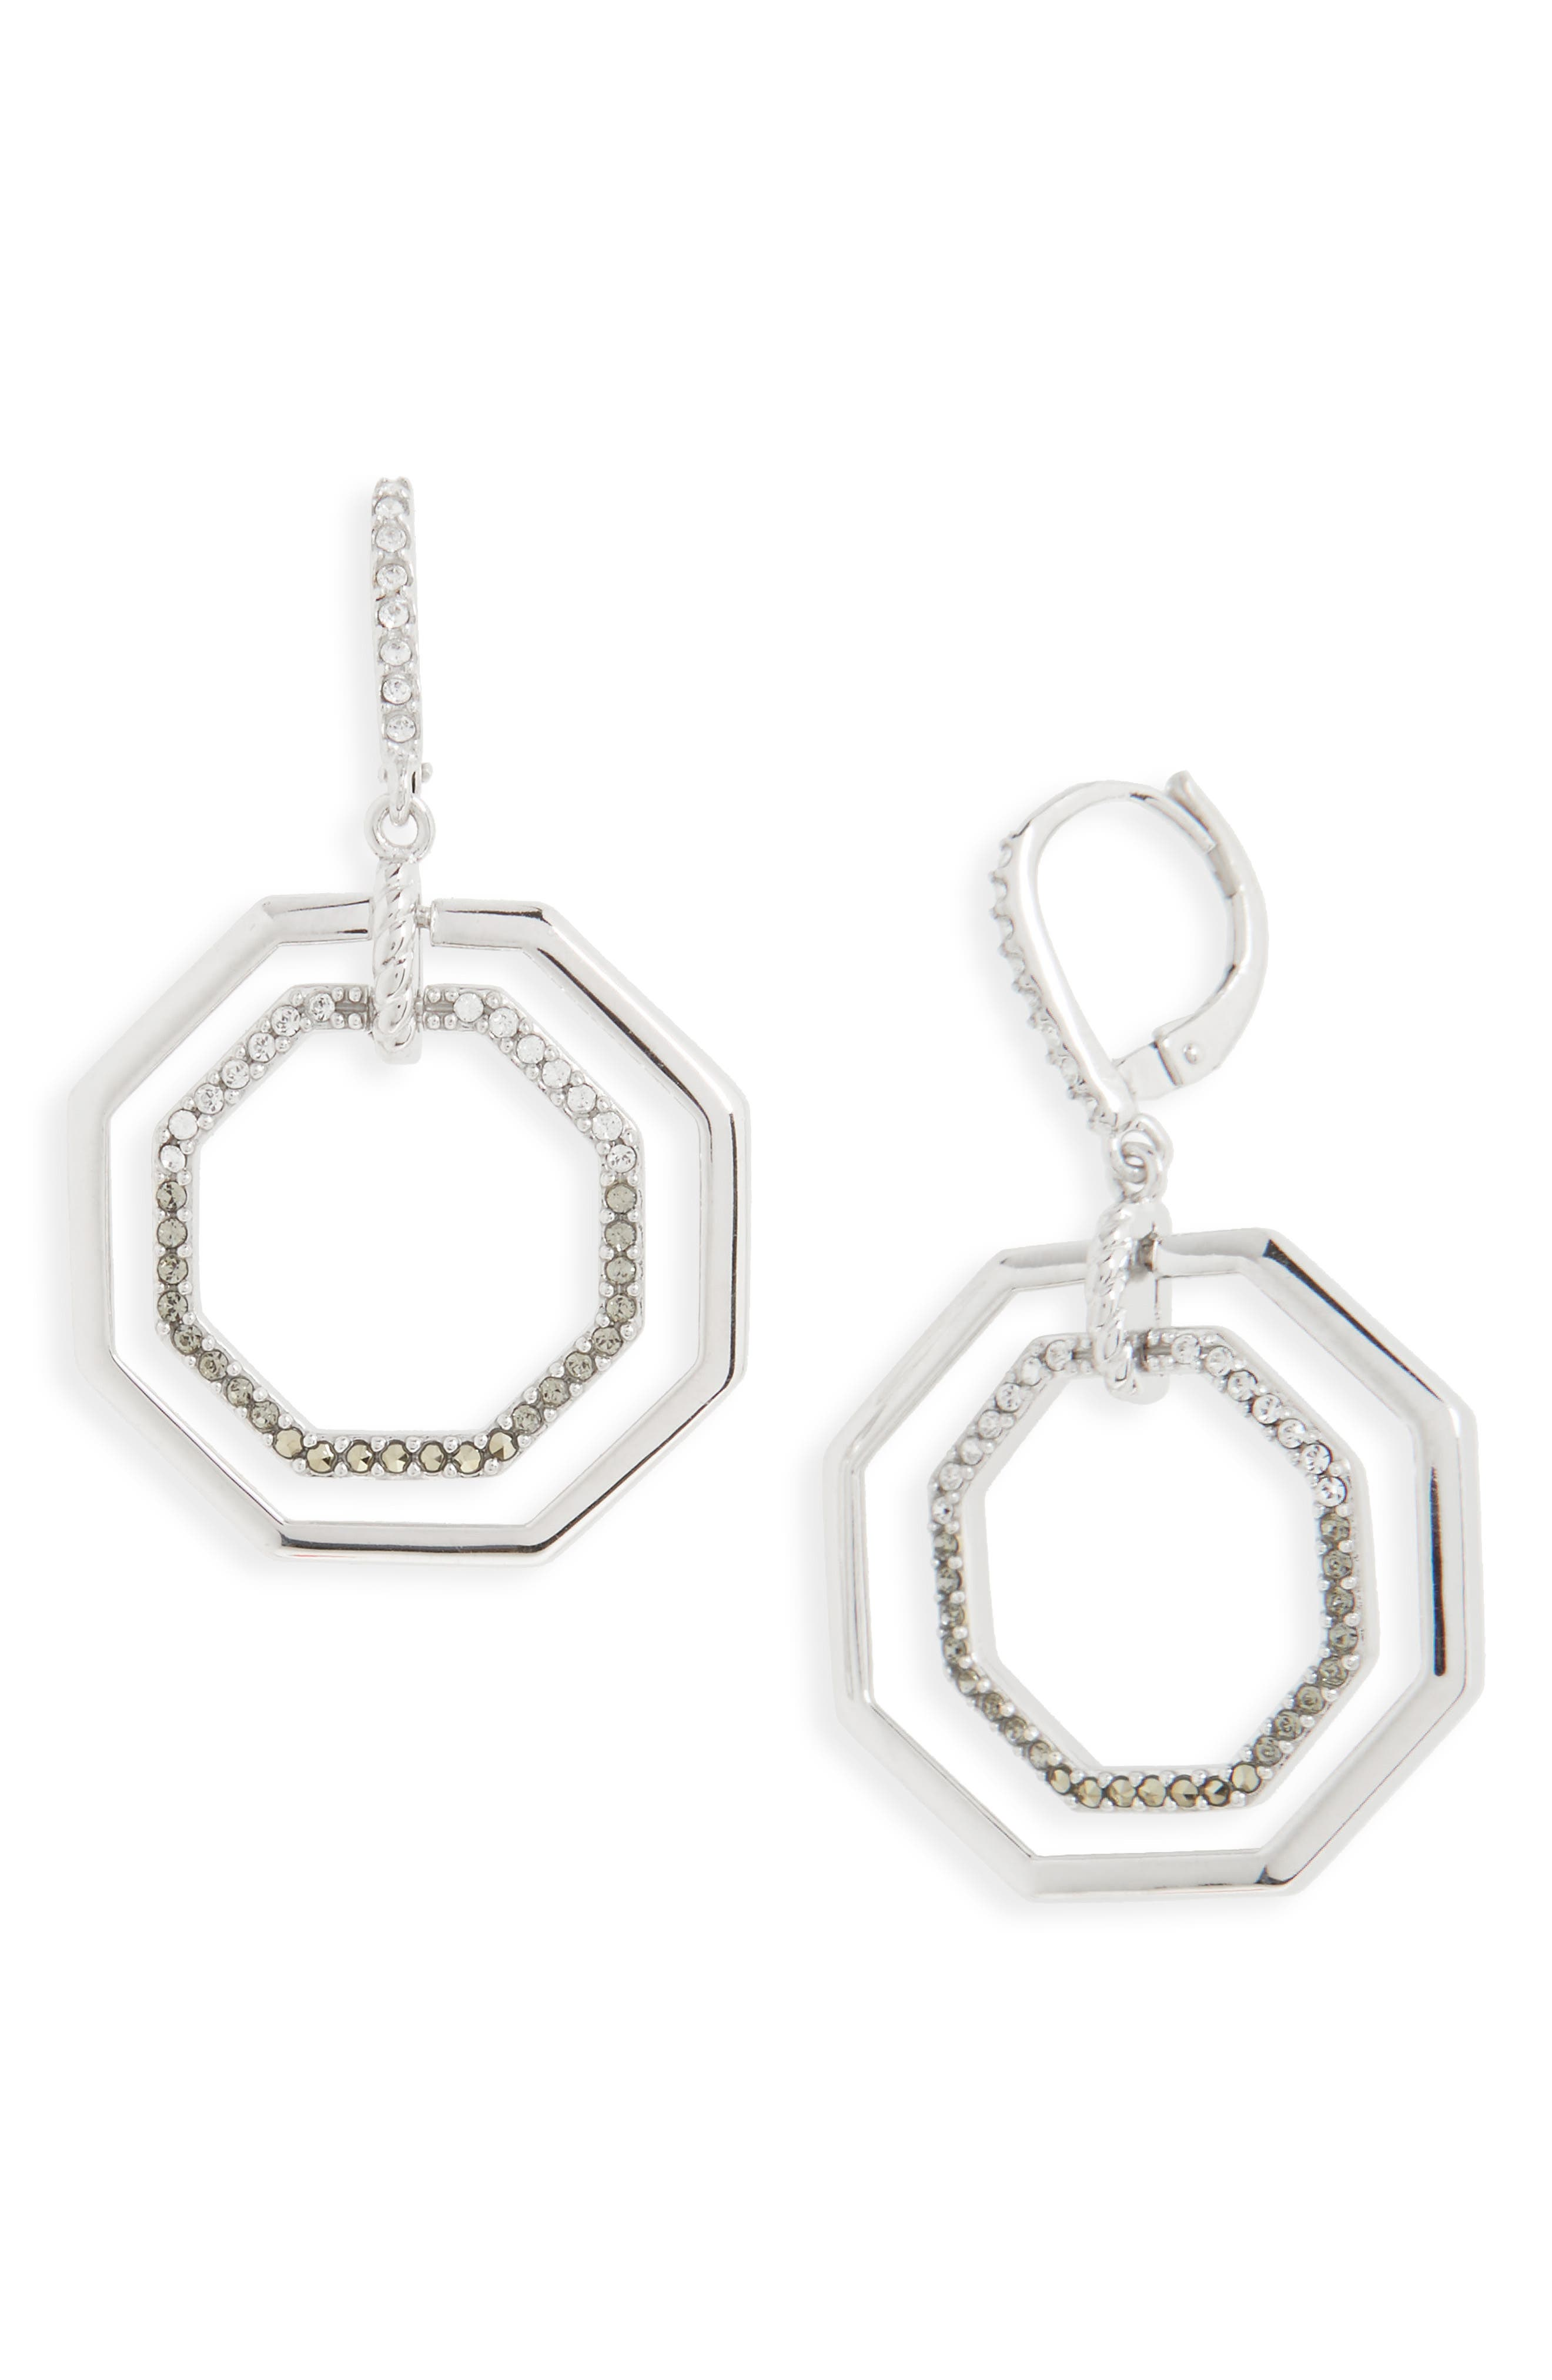 Paradise Open Drop Earrings,                         Main,                         color, Black Diamond/ Marcasite